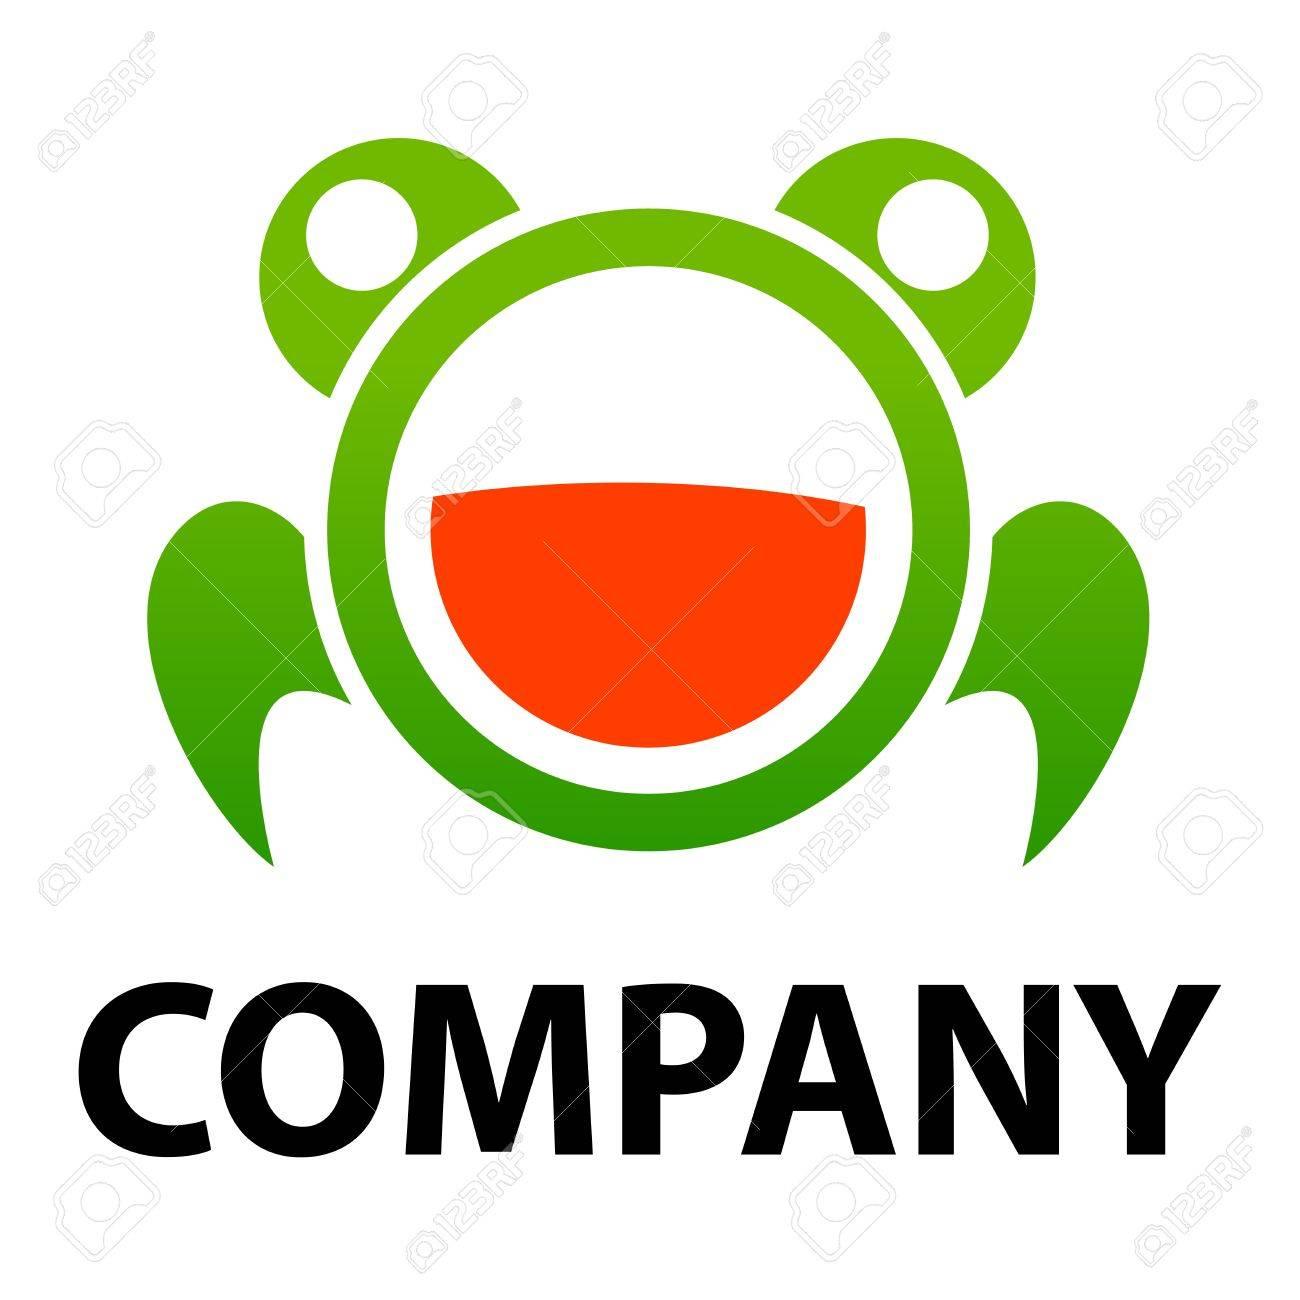 Frog logo vector Stock Vector - 17078163